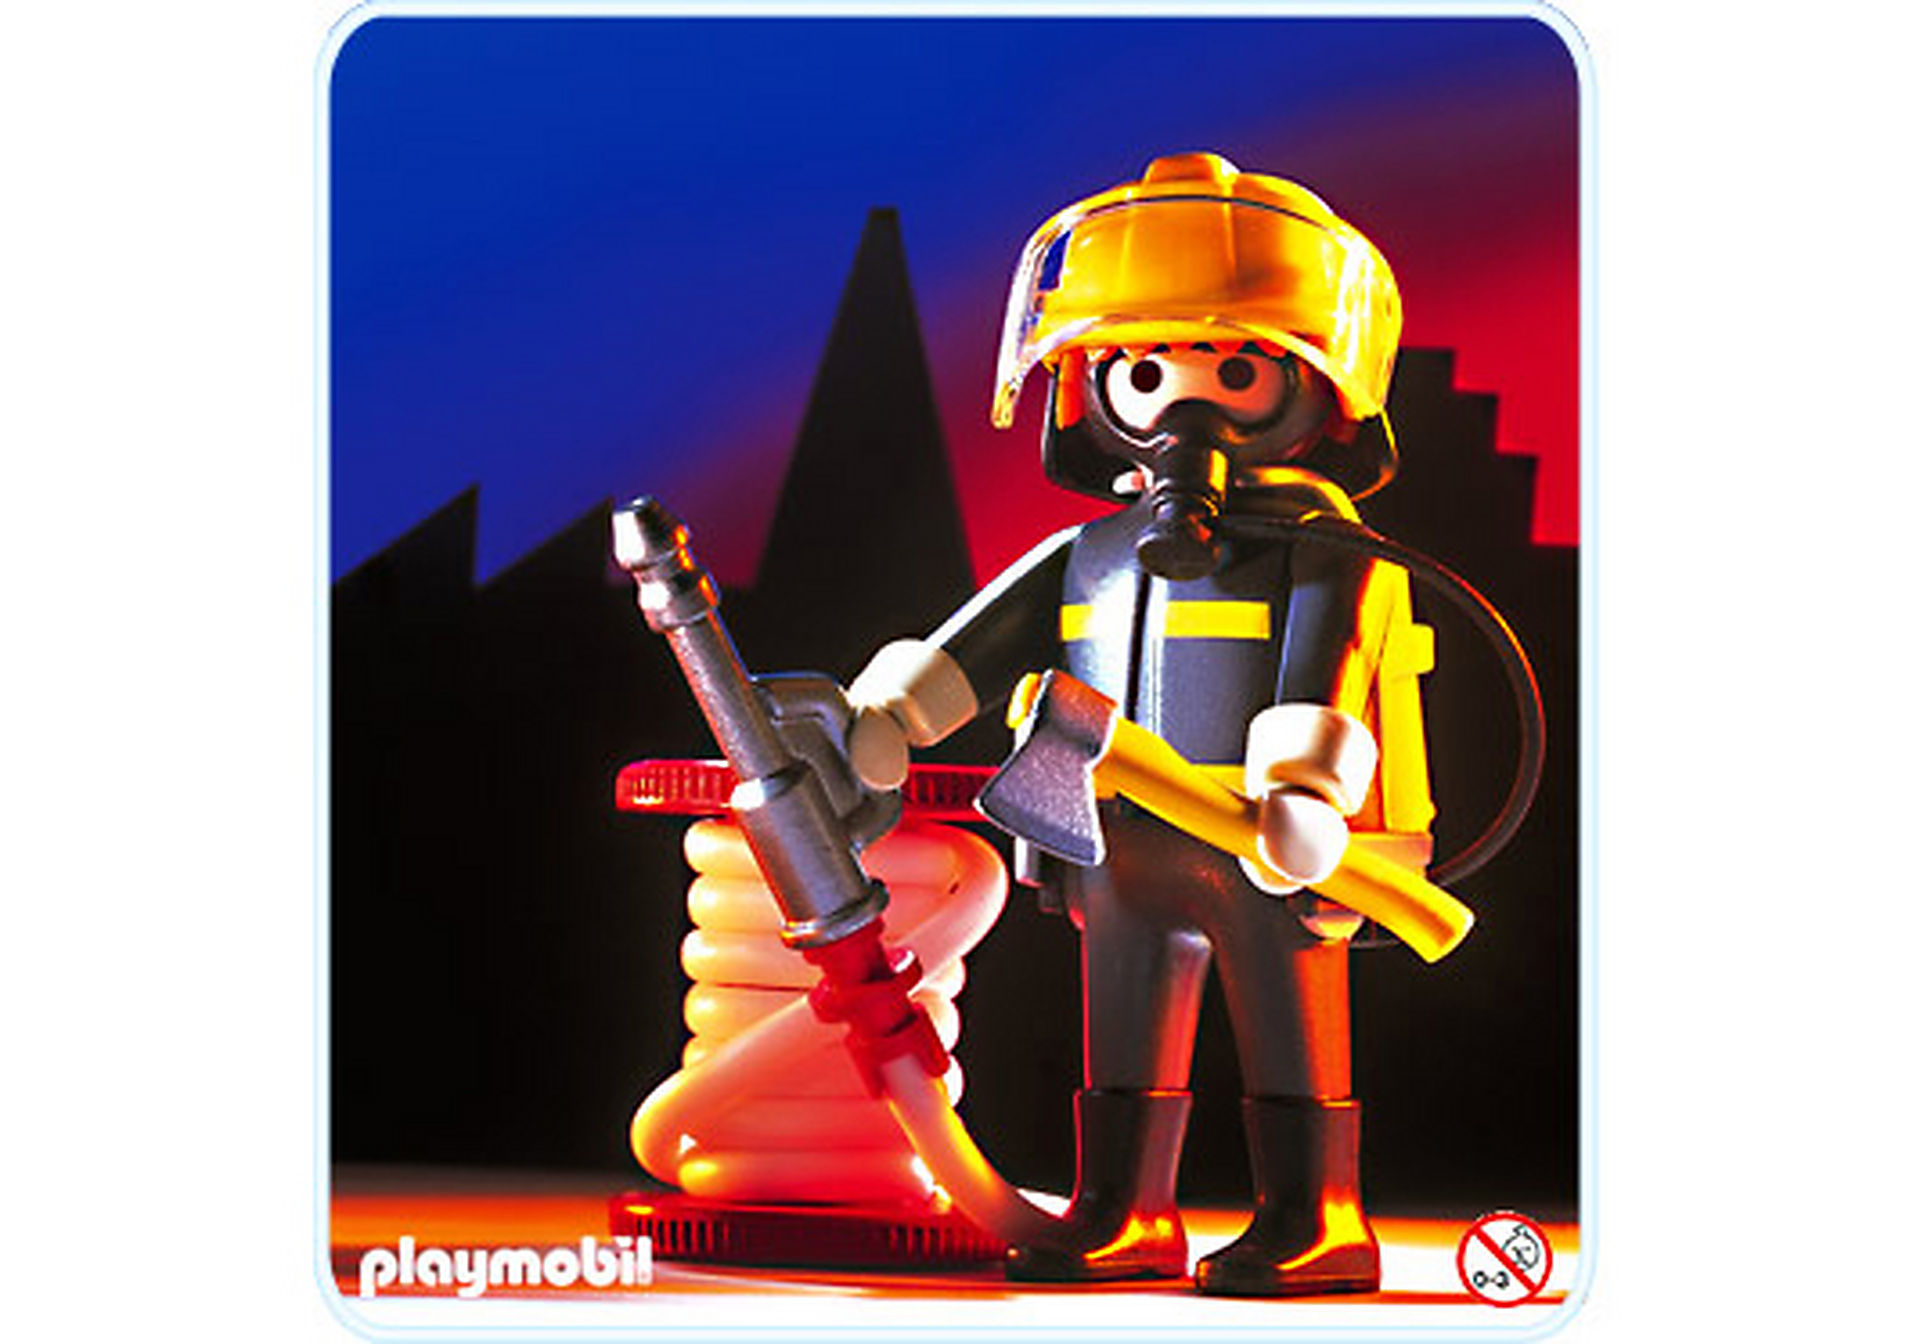 http://media.playmobil.com/i/playmobil/3882-A_product_detail/Feuerwehrmann